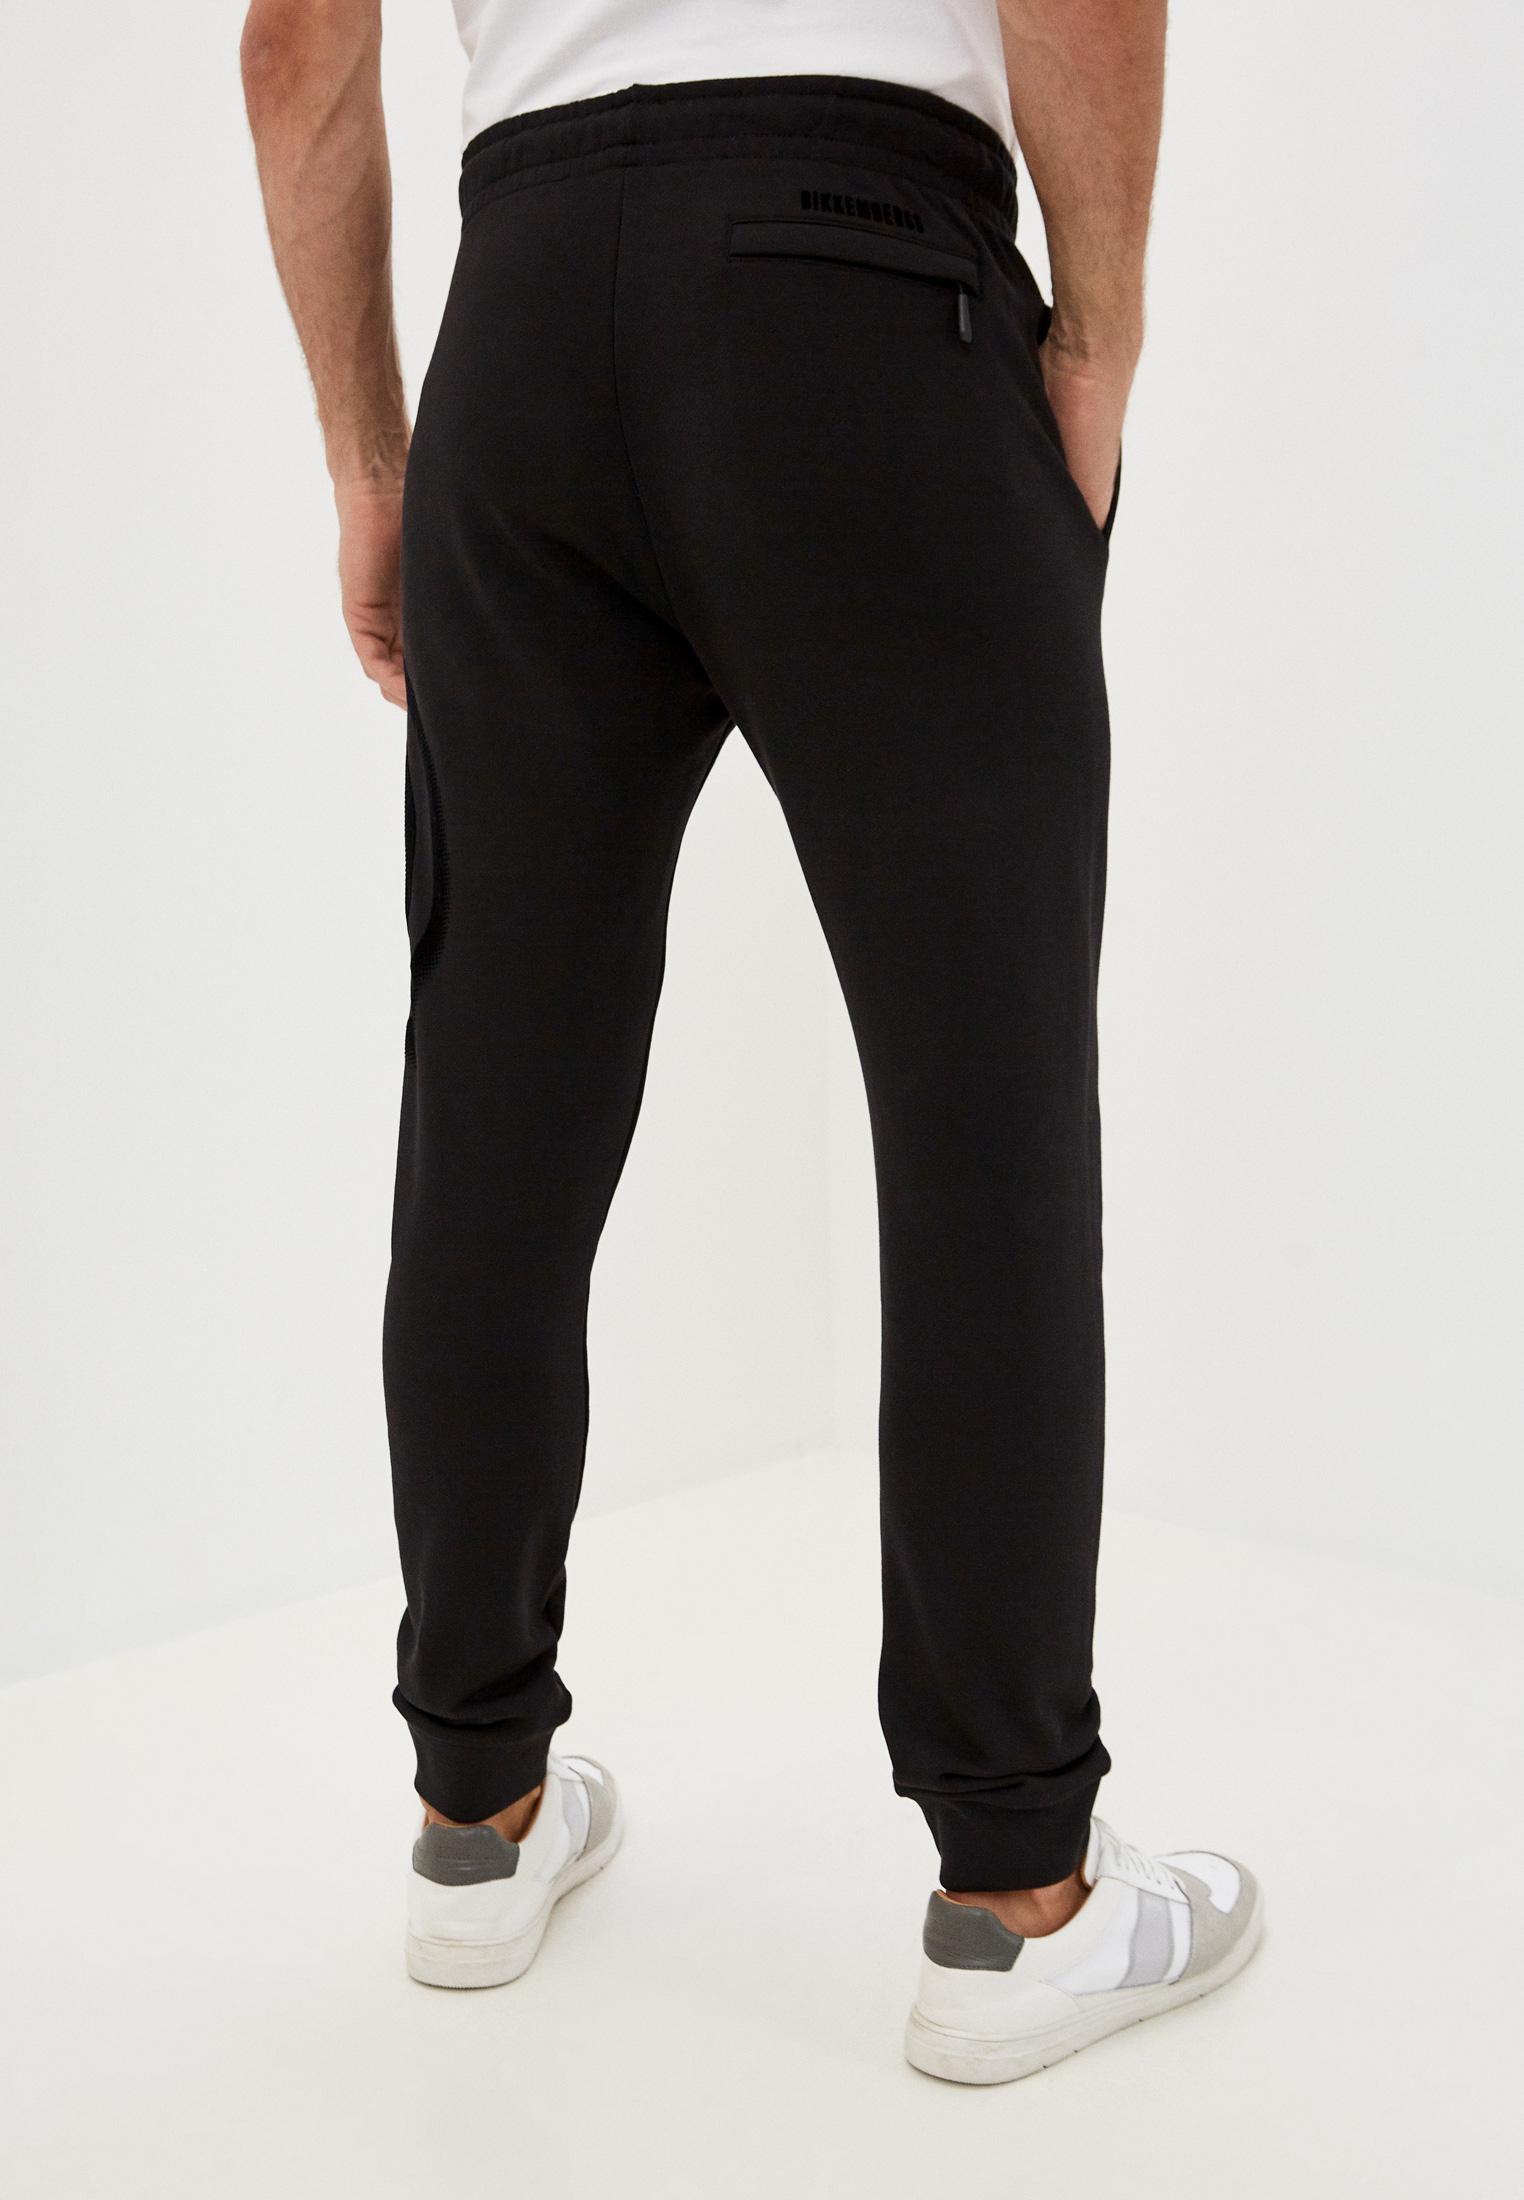 Мужские спортивные брюки Bikkembergs (Биккембергс) C 1 159 1T M 4121: изображение 4